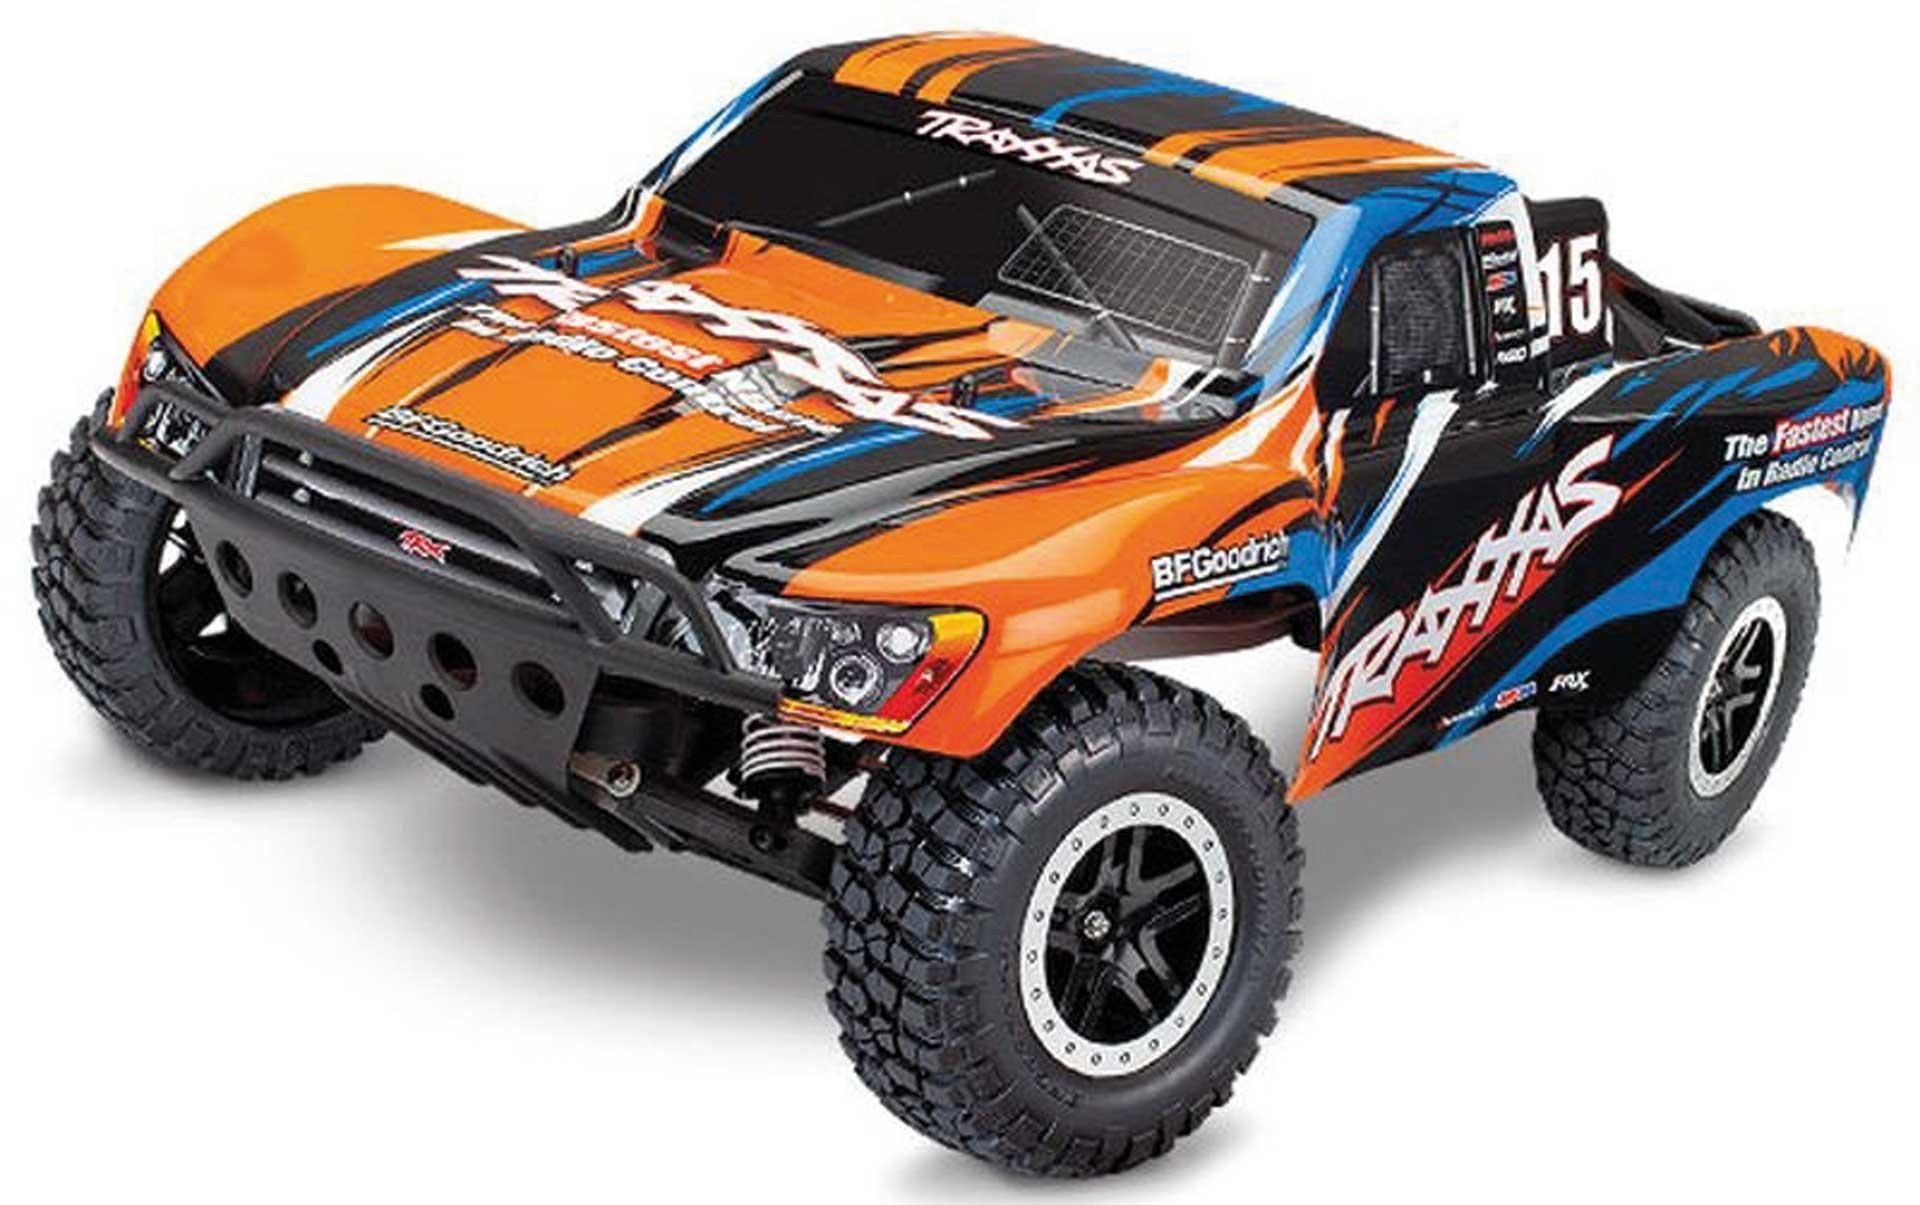 Traxxas SLASH ORANGEX RTR +12V-LADER+AKKU 1/10 2WD SHORT COURSE RACING TRUCK BRUSHED